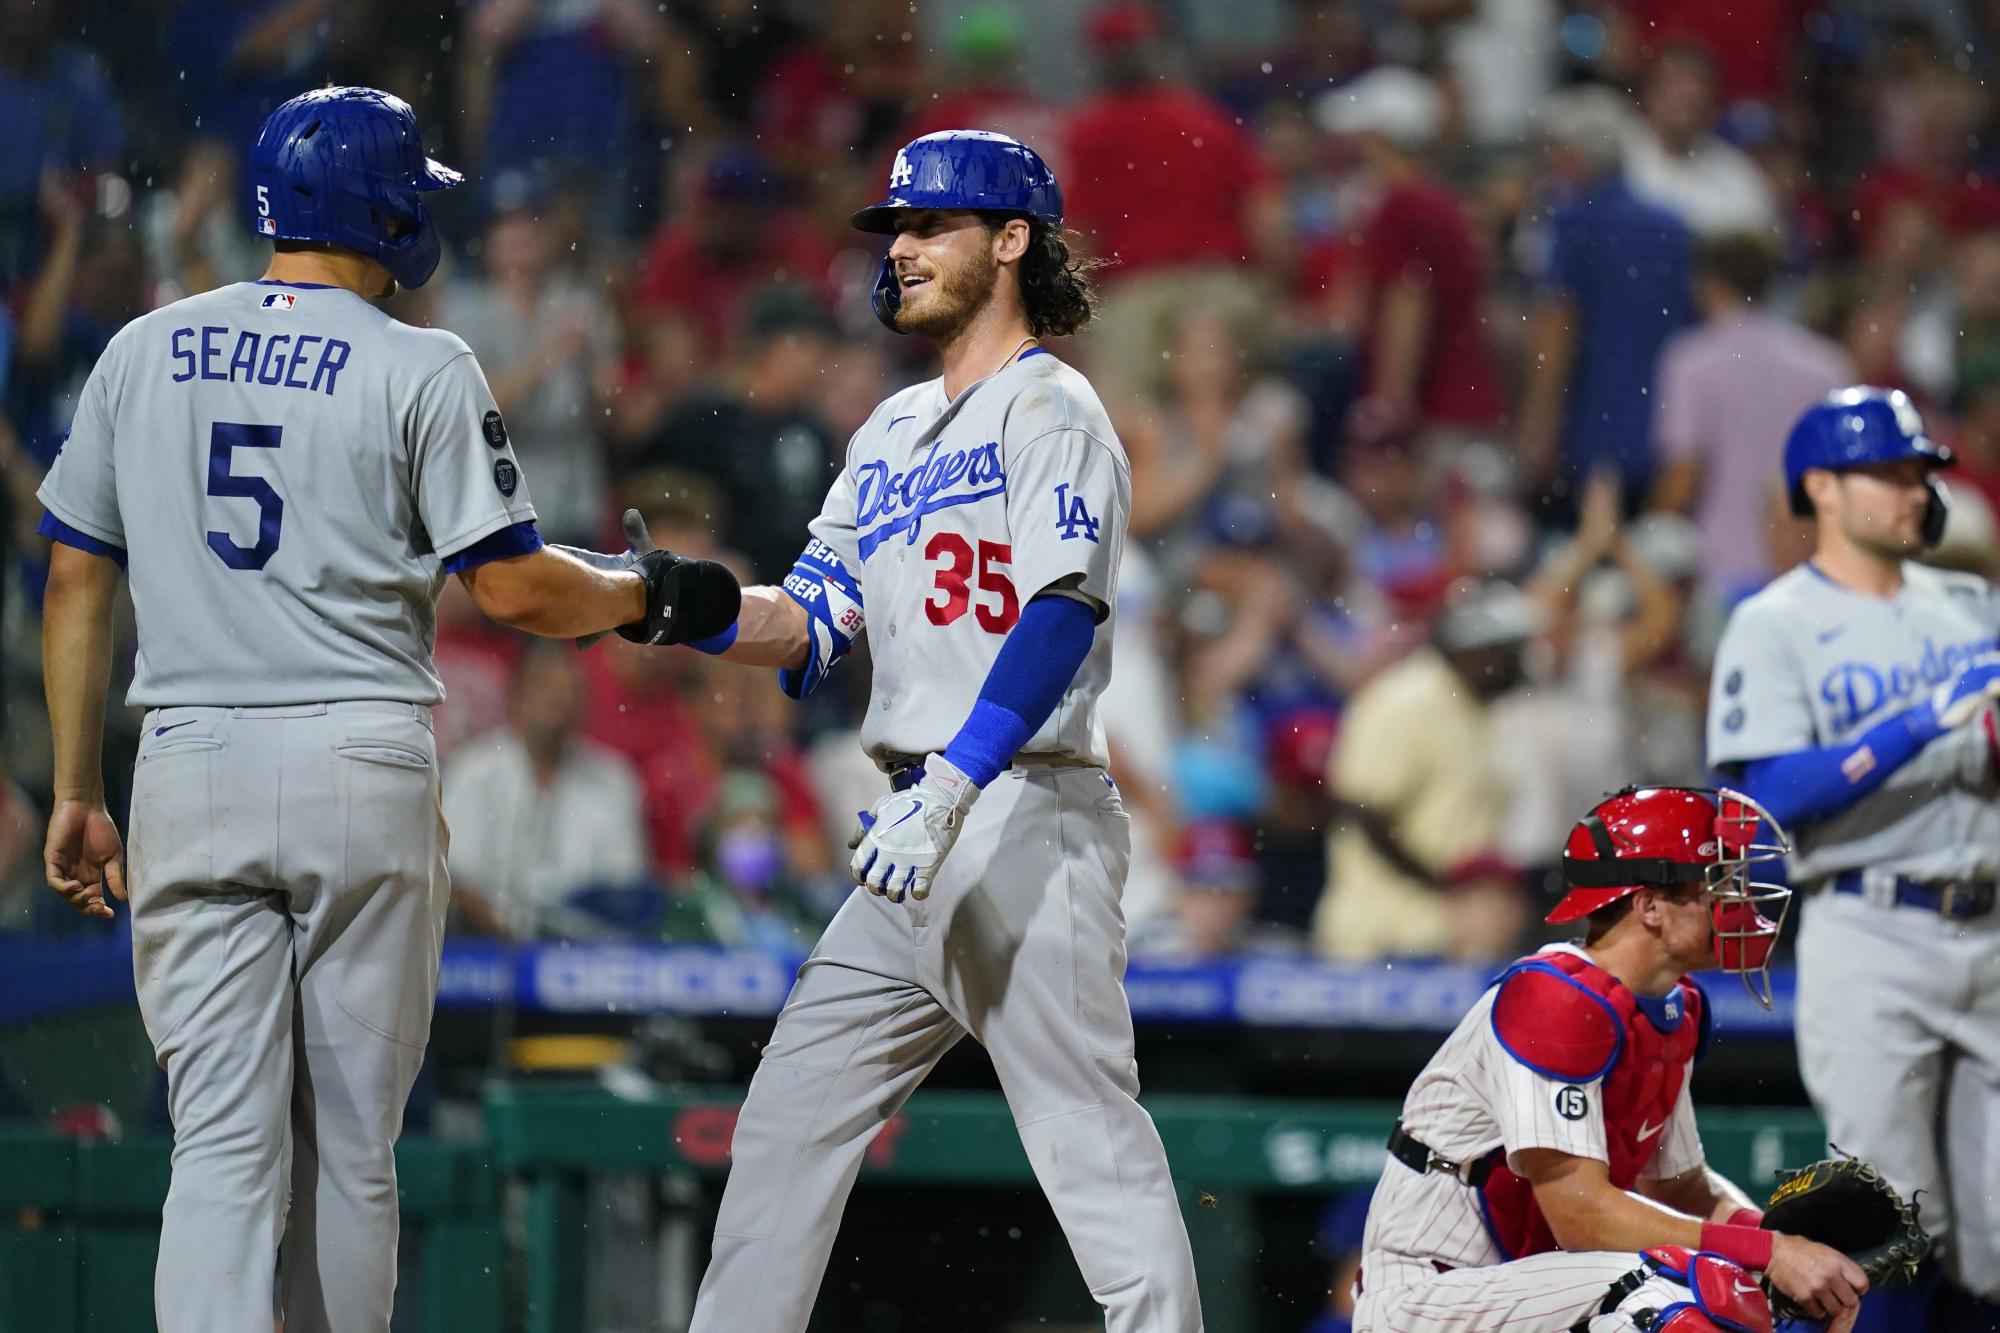 Dodgers' Bellinger 2 HRs, connects in marathon AB vs Phils